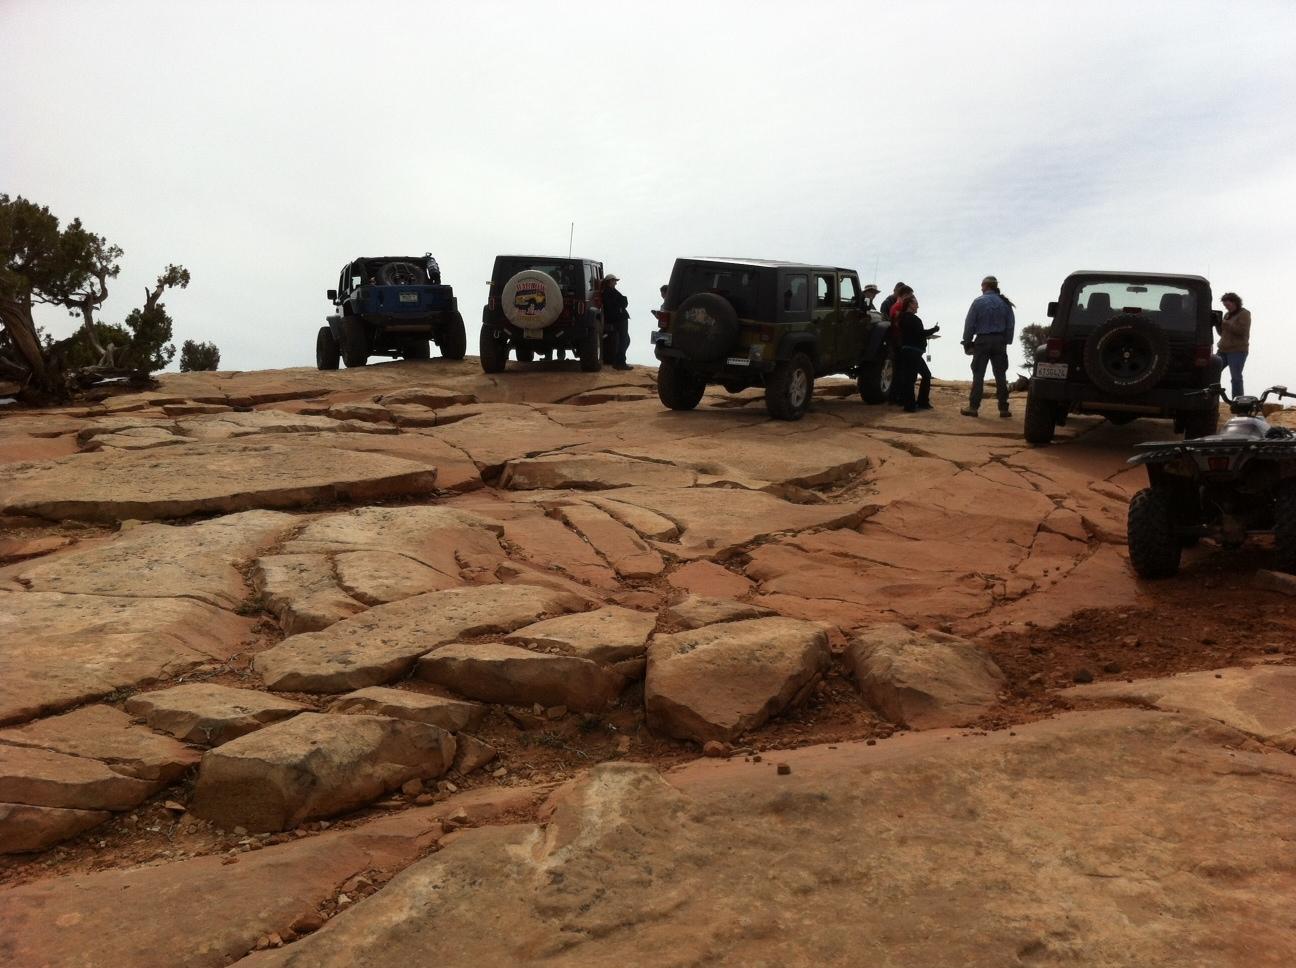 Easter Jeep Safari 2012- Moab, UT